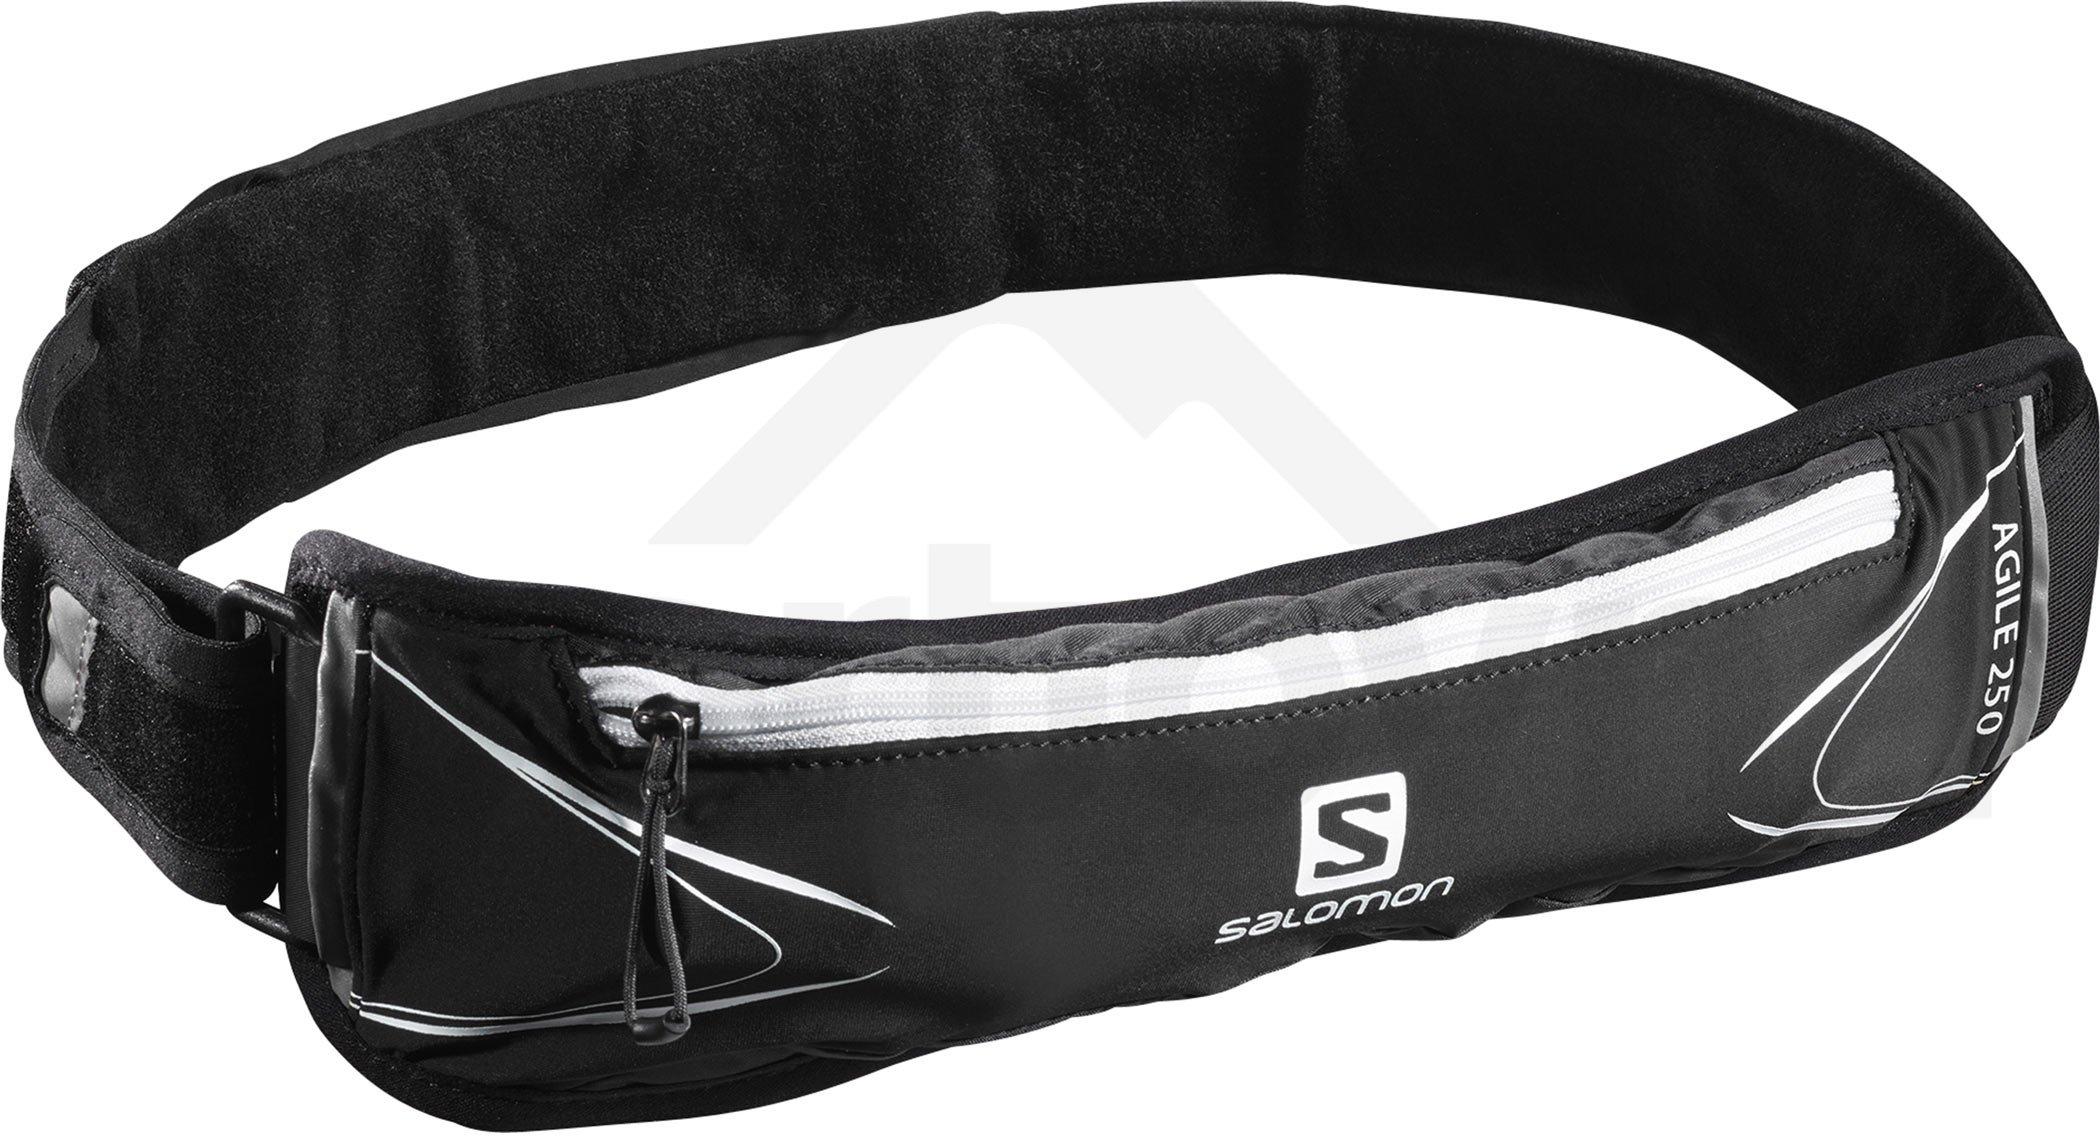 salomon-lc1303300-agile-250-set-belt_3